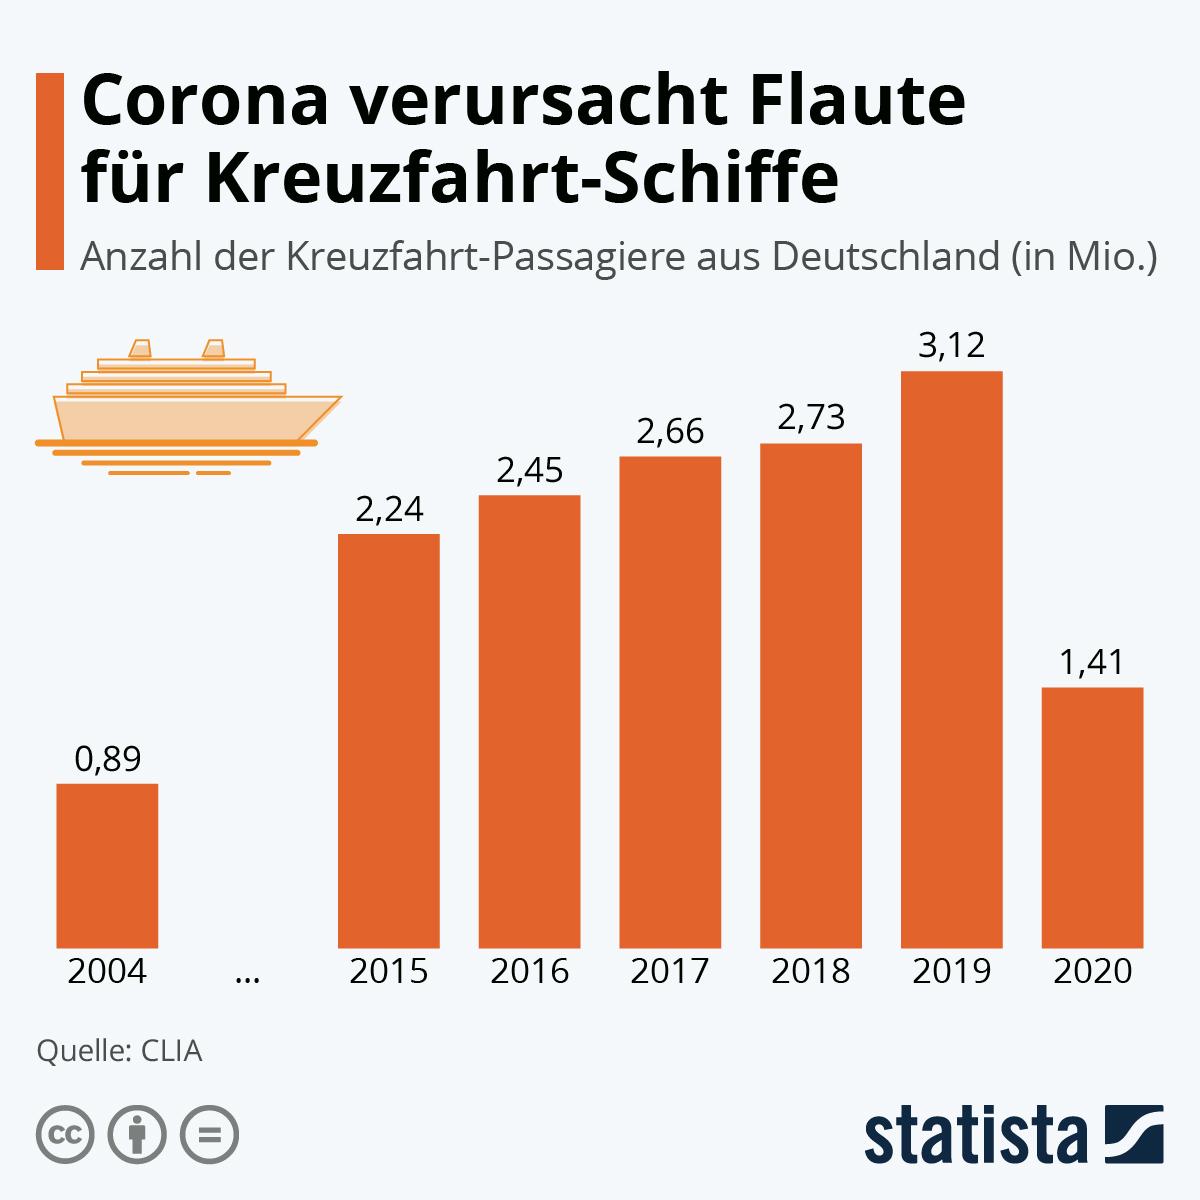 Infografik: Corona verursacht Flaute für Kreuzfahrt-Schiffe | Statista